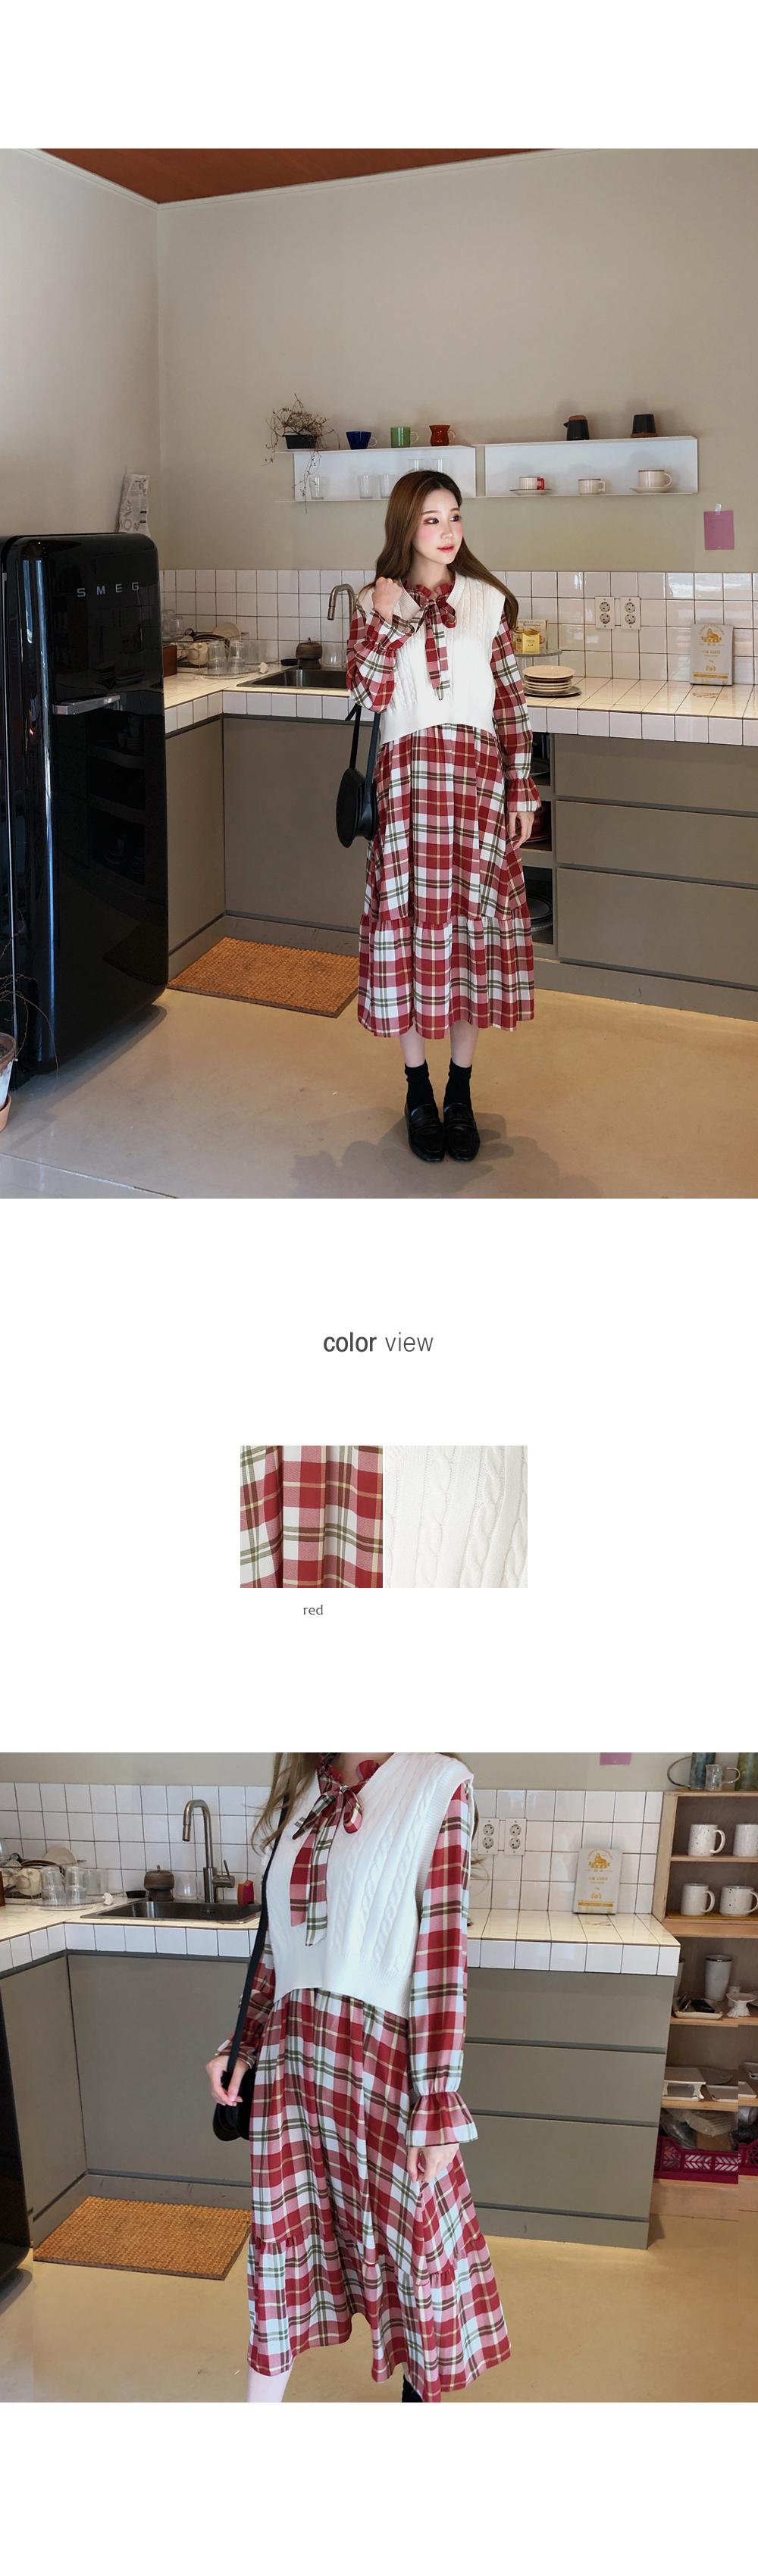 Attractive check pattern dress + best SET